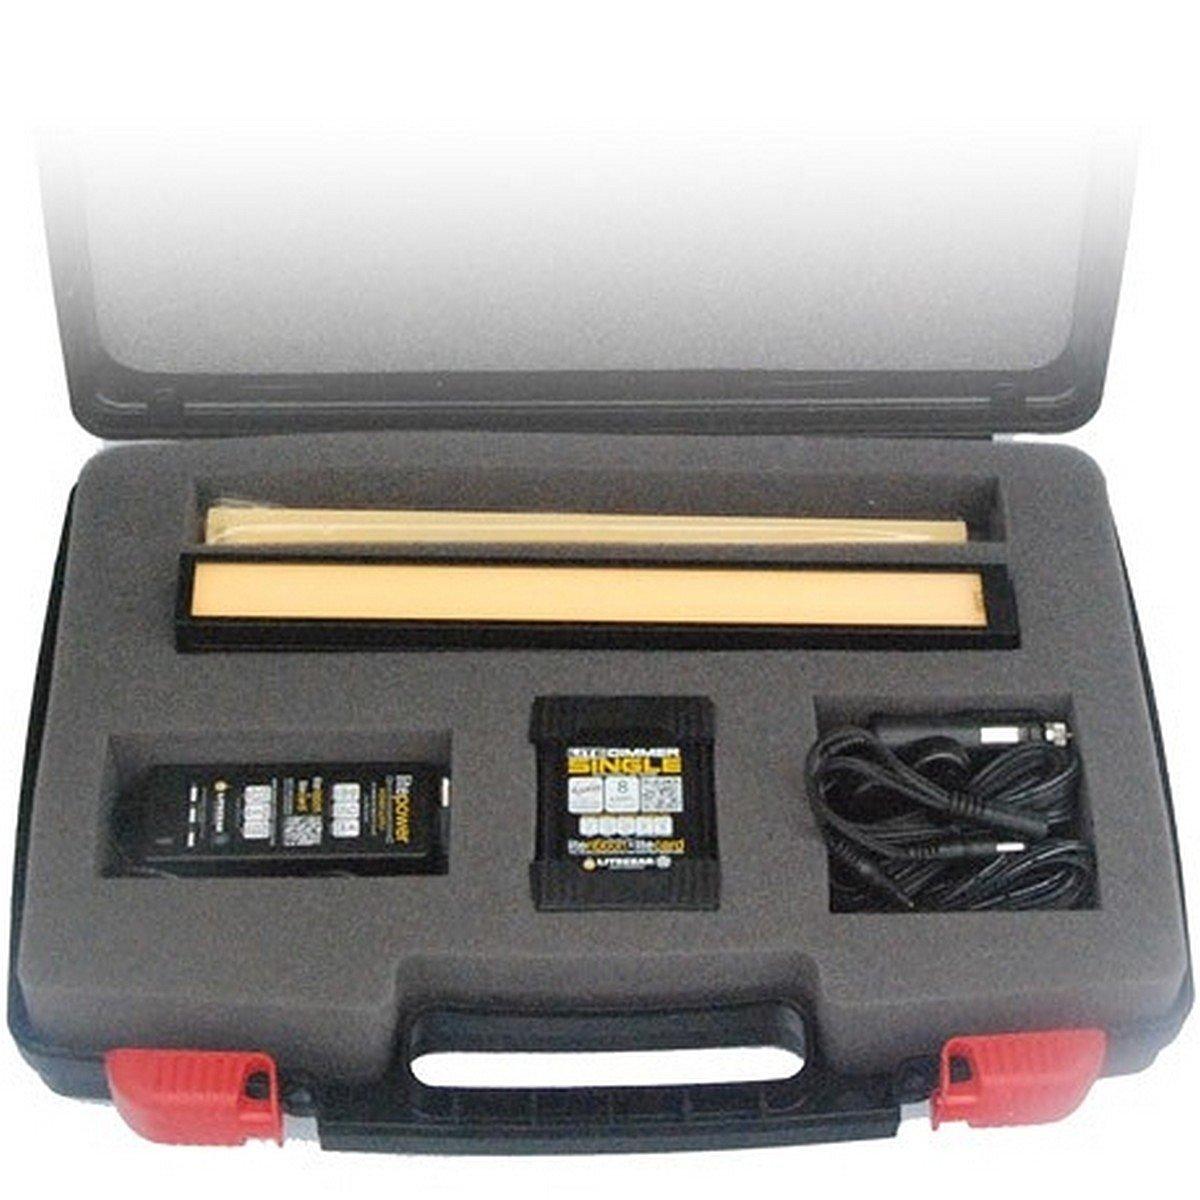 Cineo Lighting Matchstix Single Power Kit   Versatile Light Source 12inch 701.0112